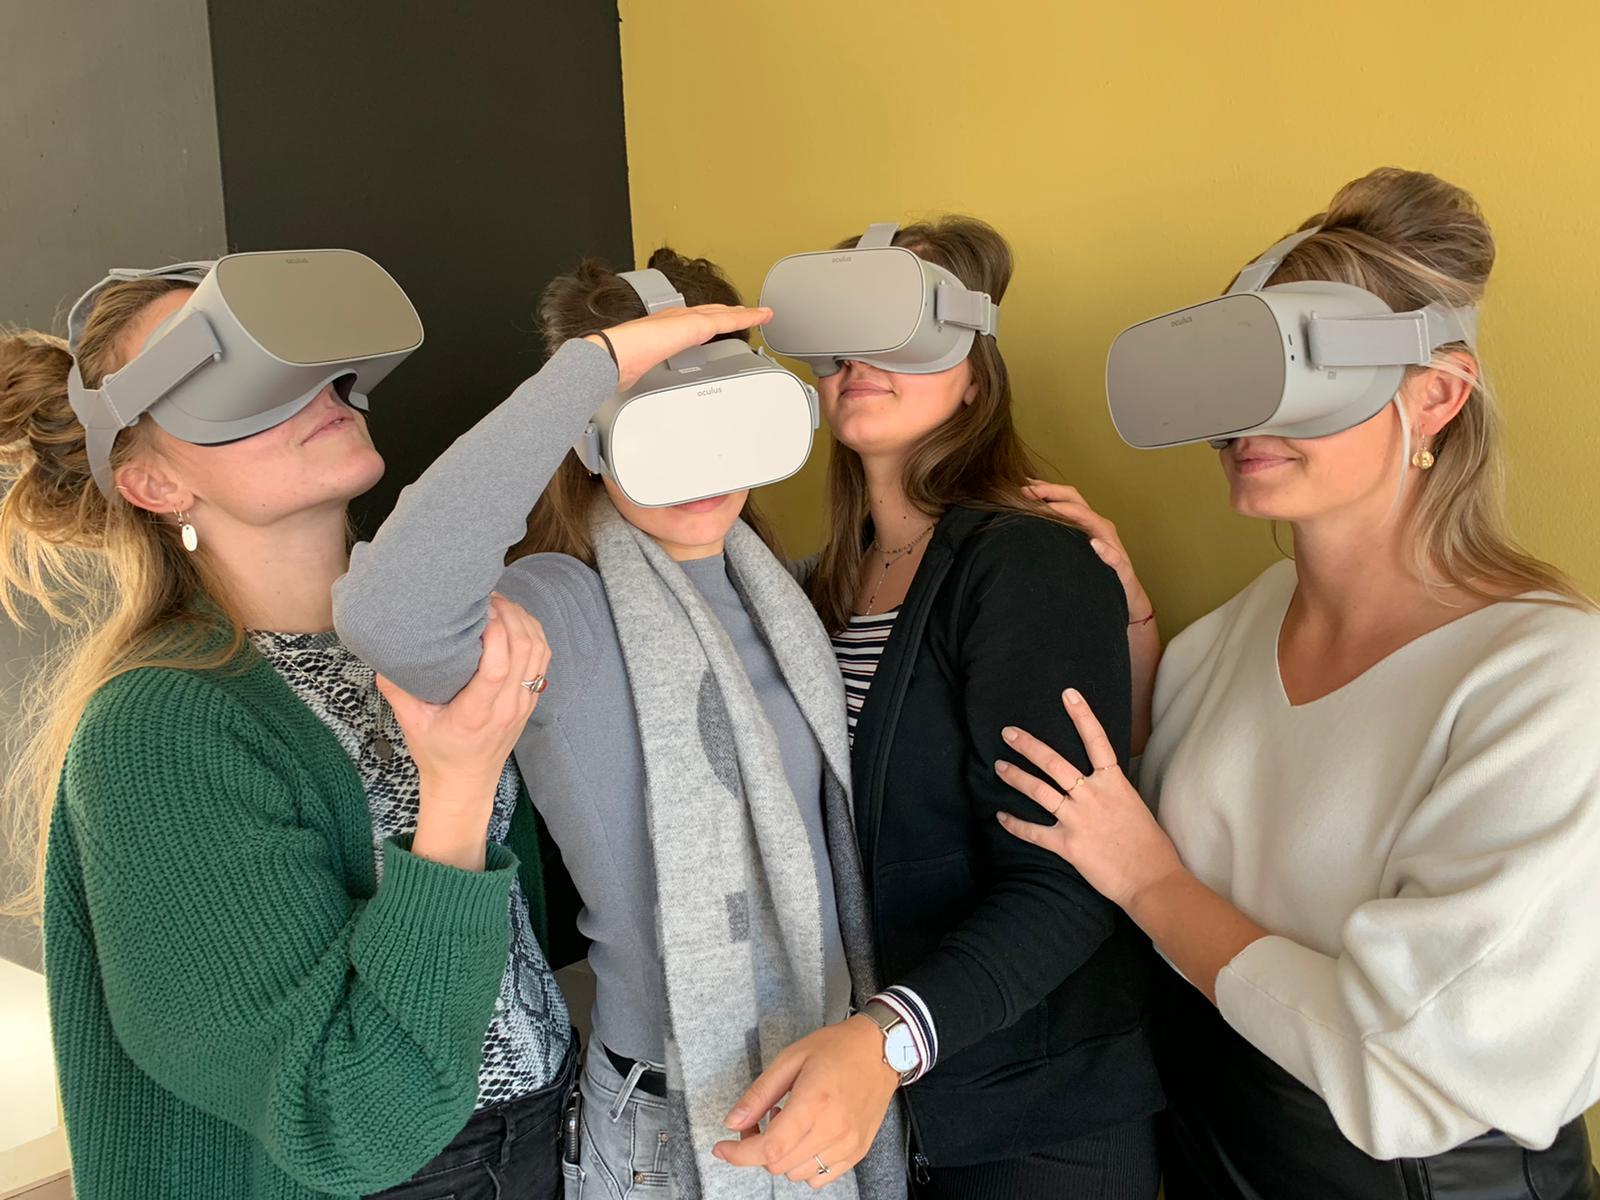 VR Escape Game La Casa de Papel